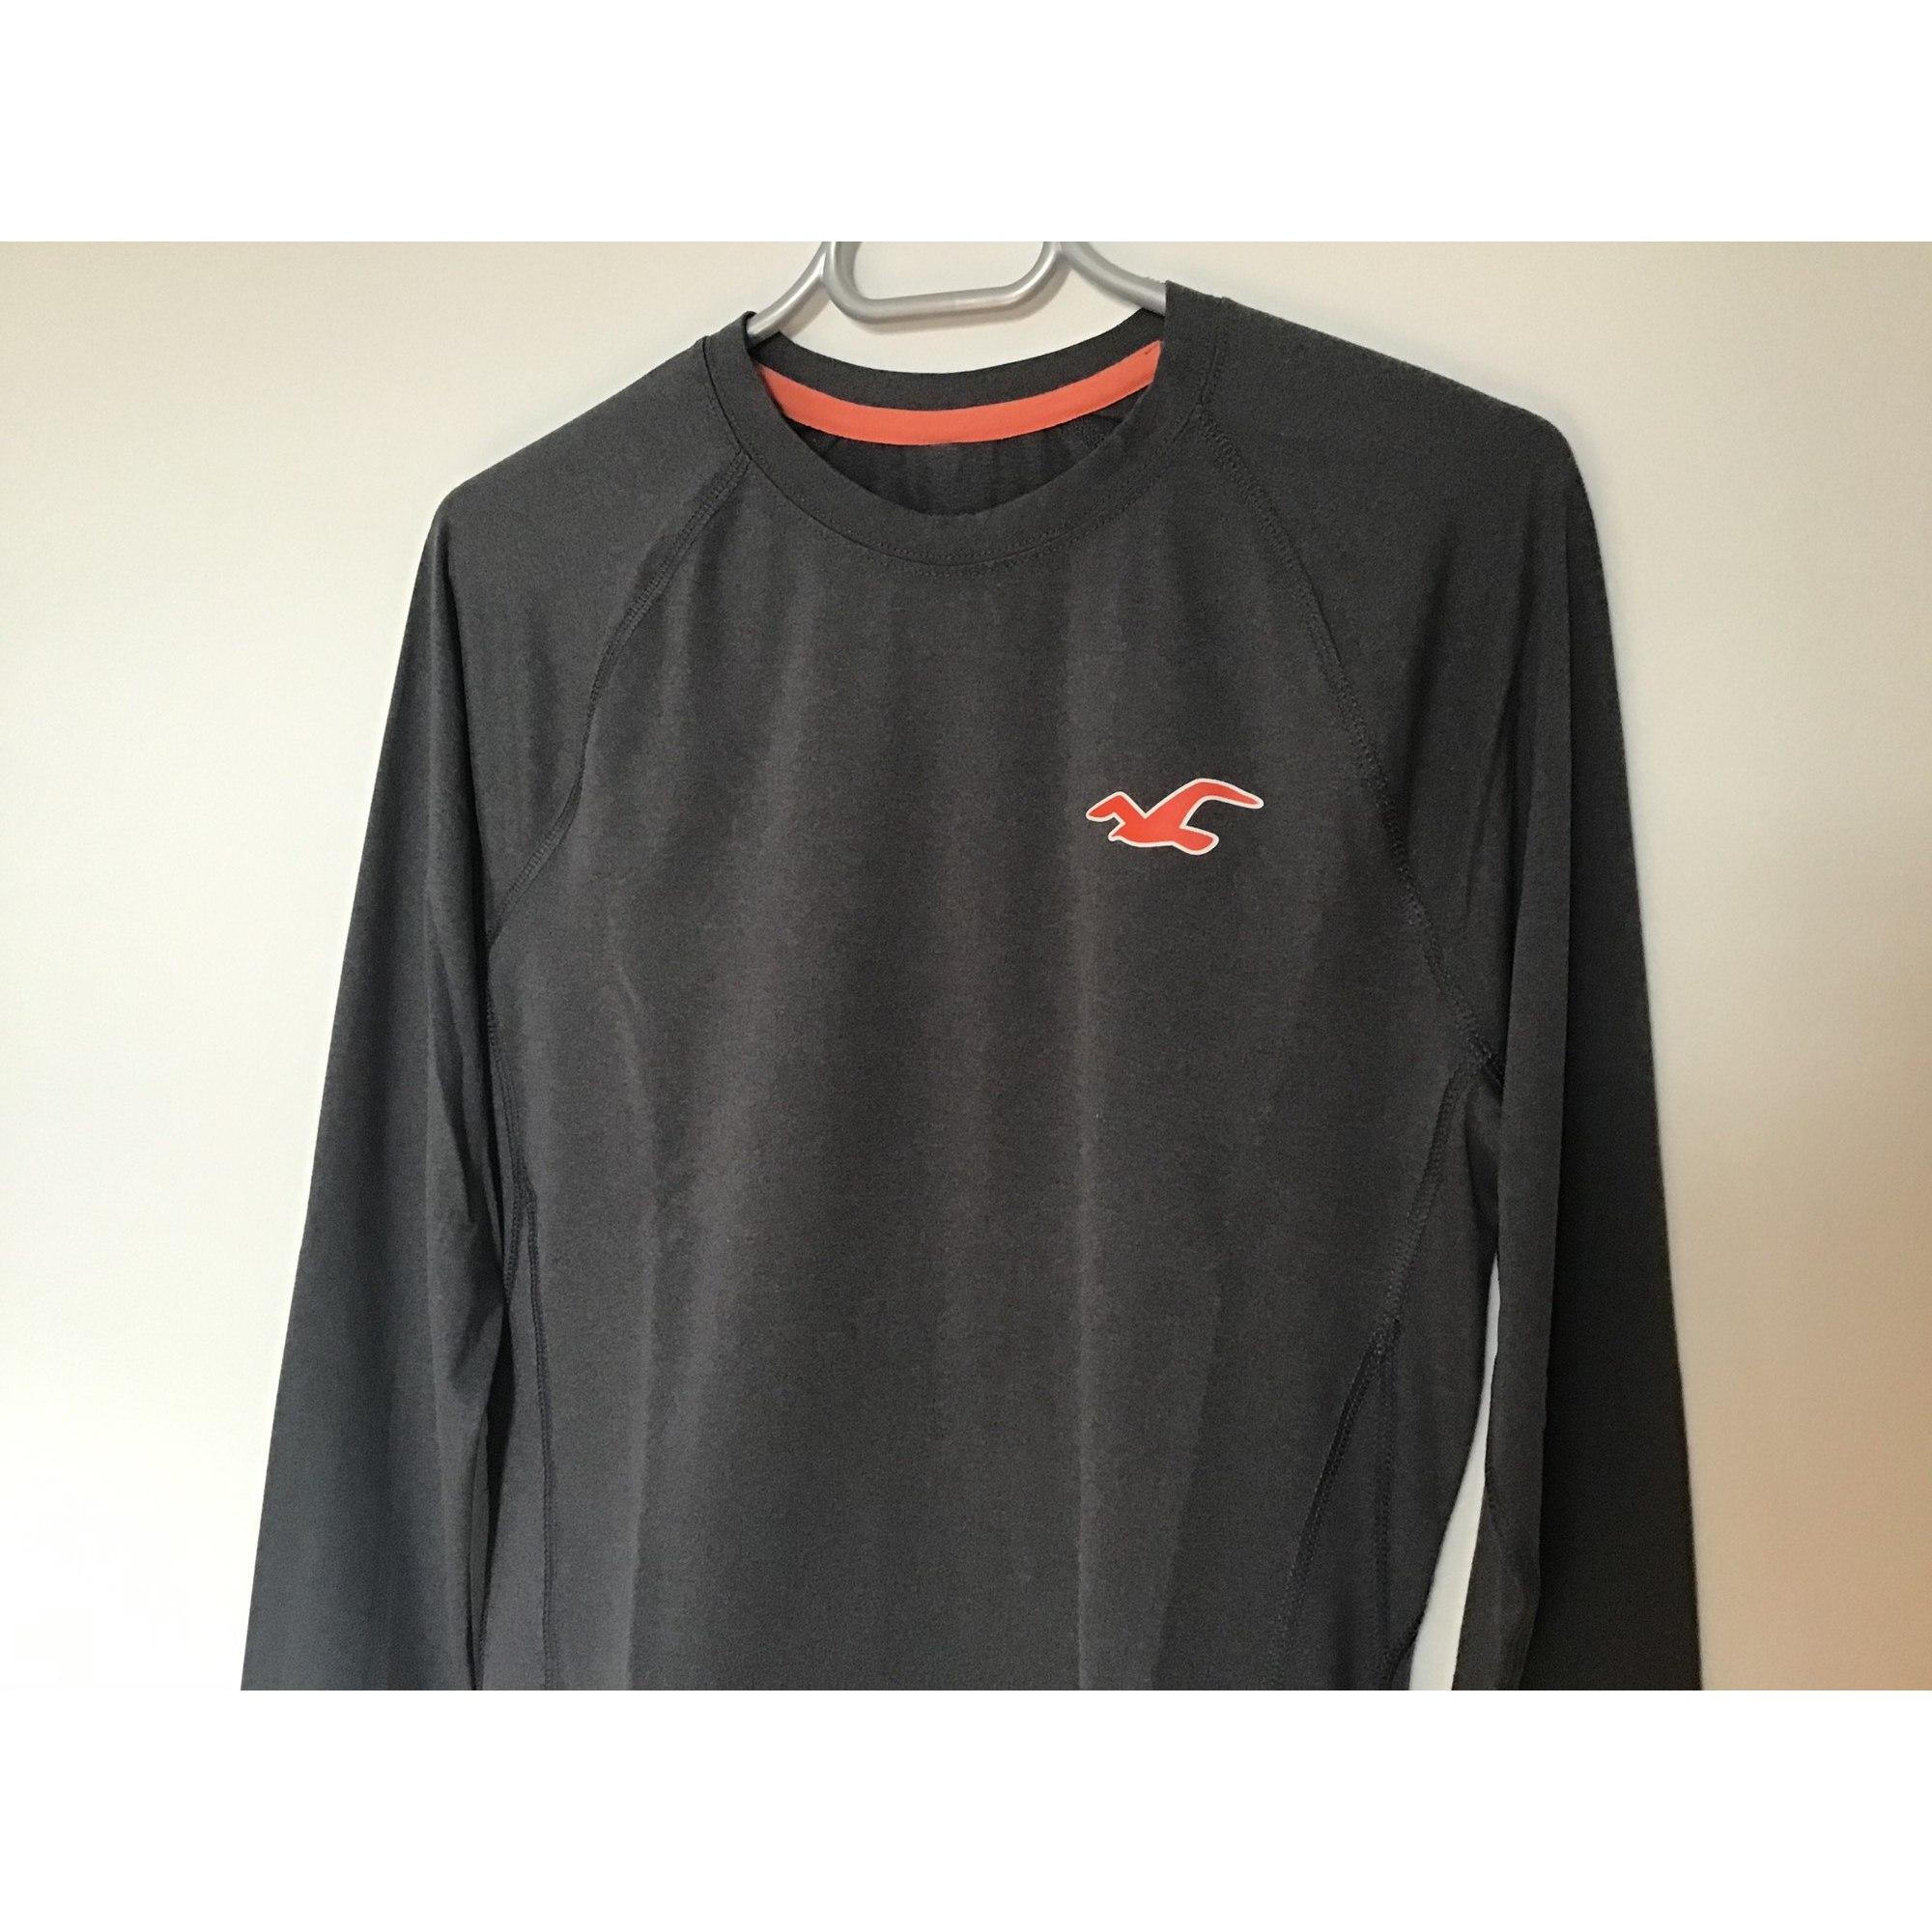 Tee-shirt HOLLISTER Gris, anthracite